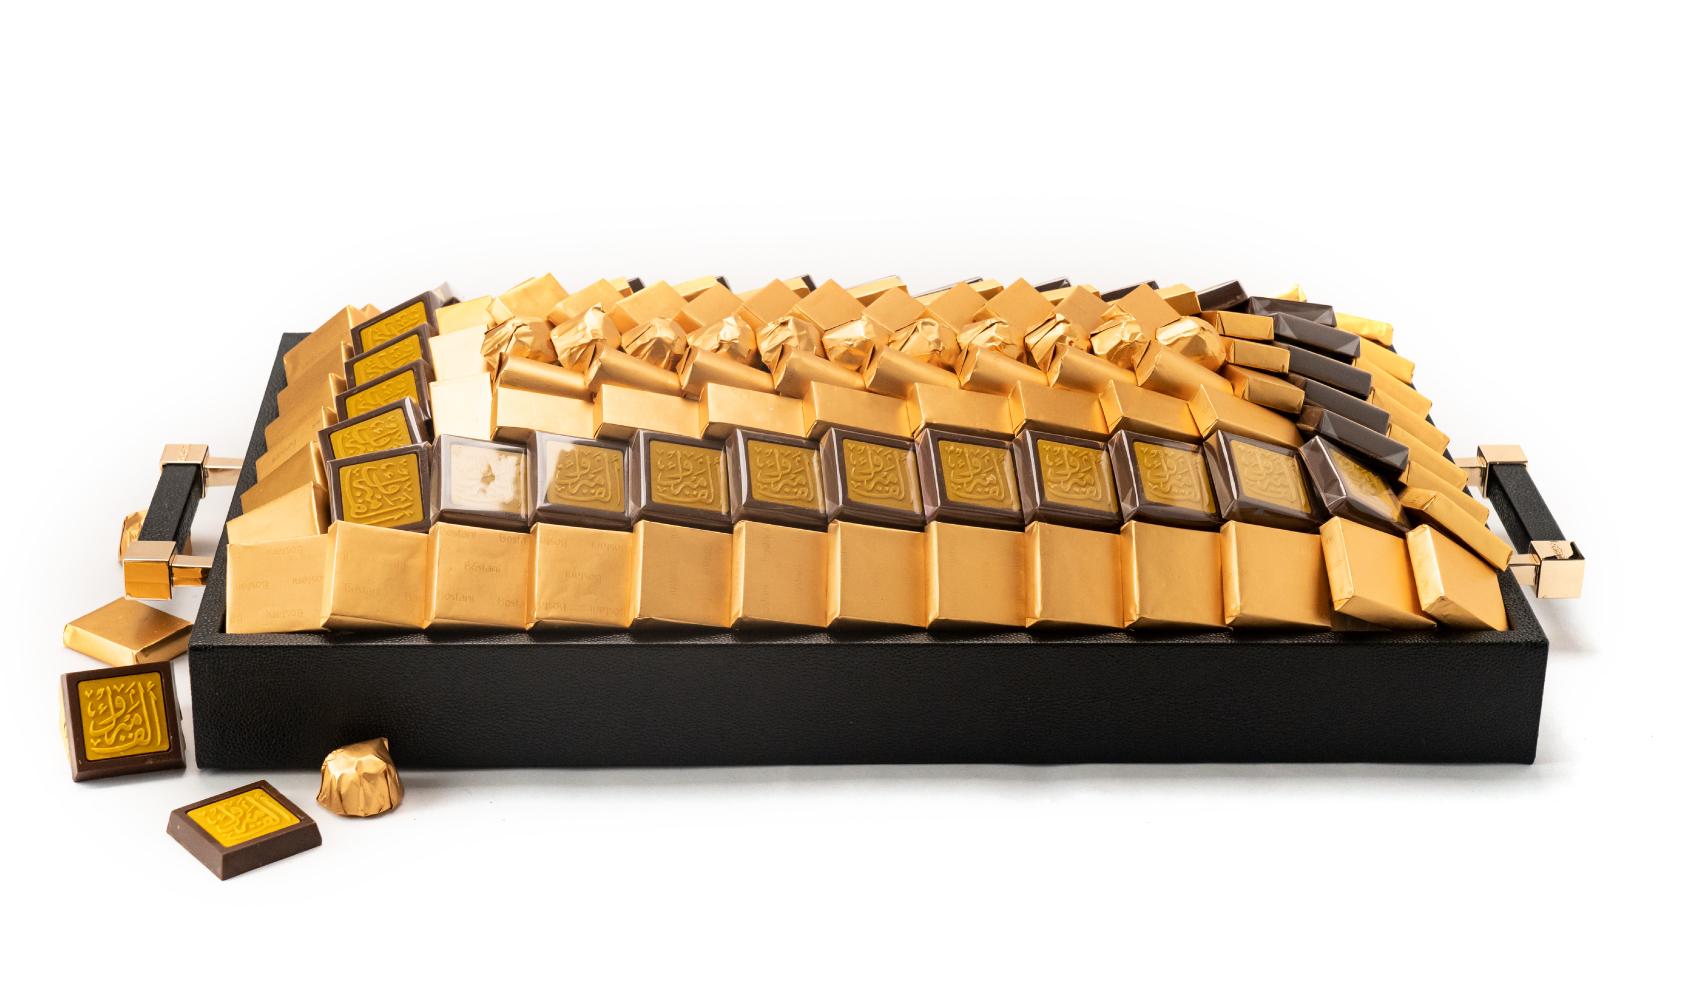 Congratulations Leathered Black Tray Medium